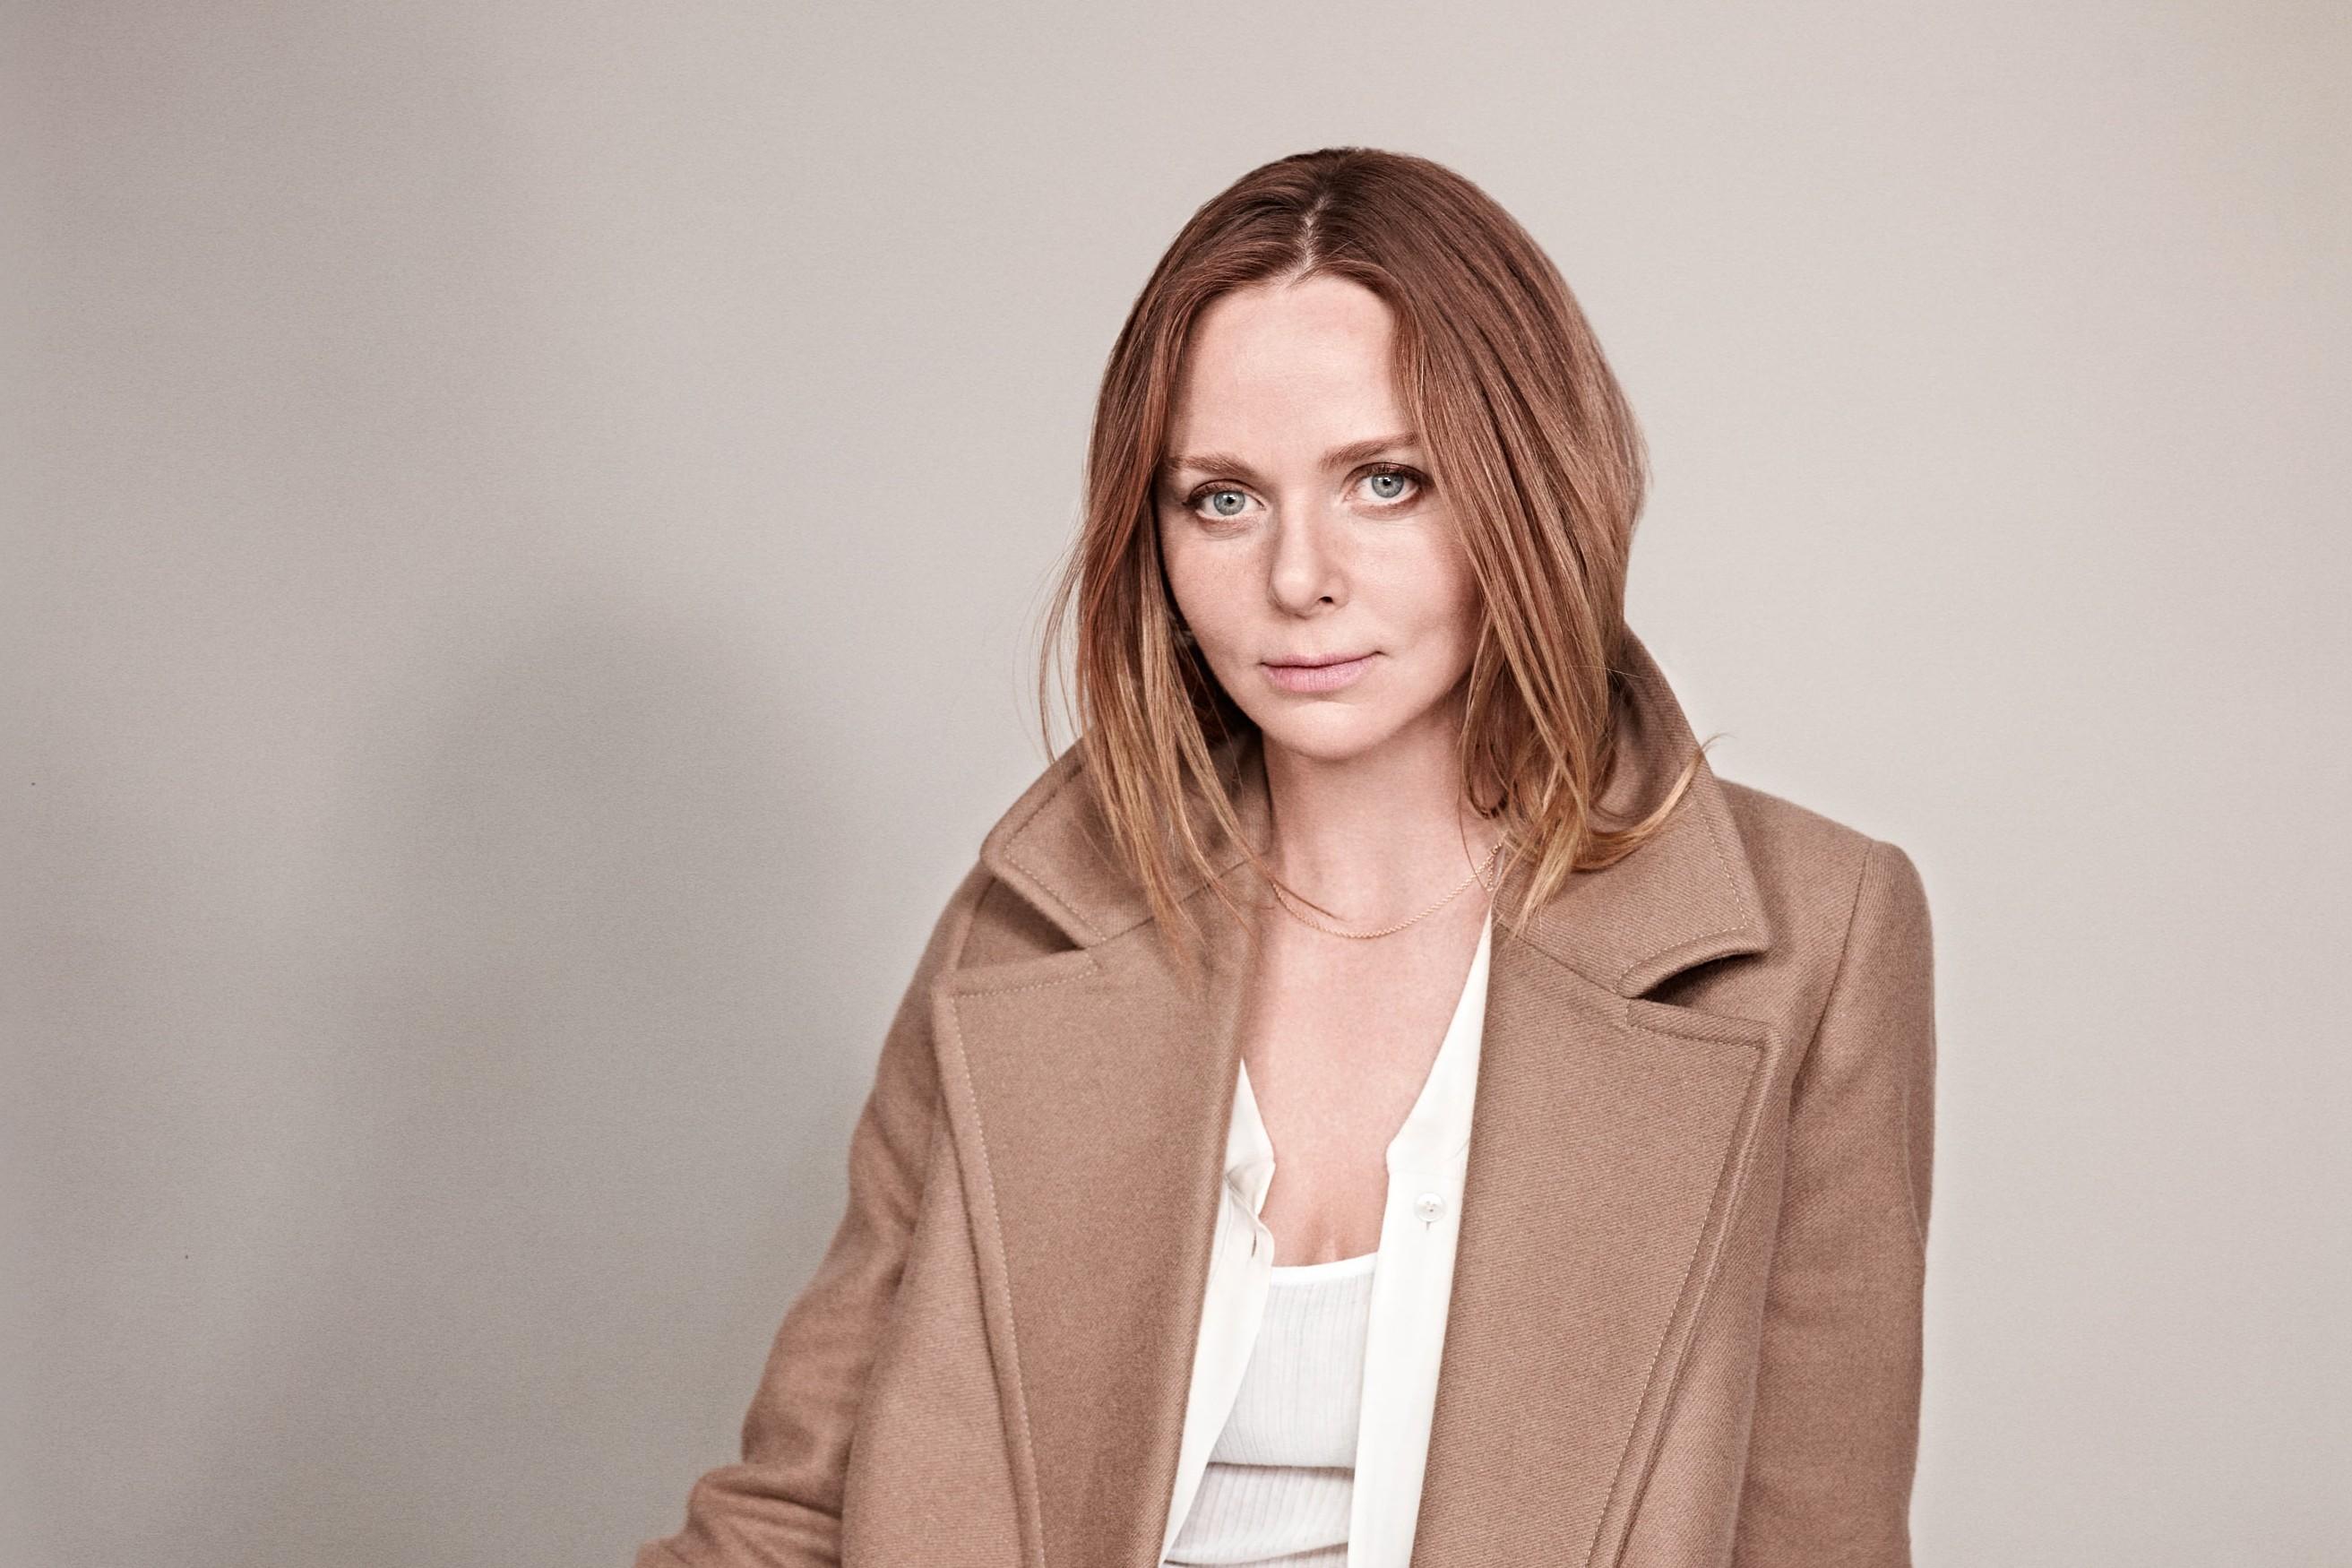 Stella McCartney Teams Up With Fashion Powerhouse LVMH